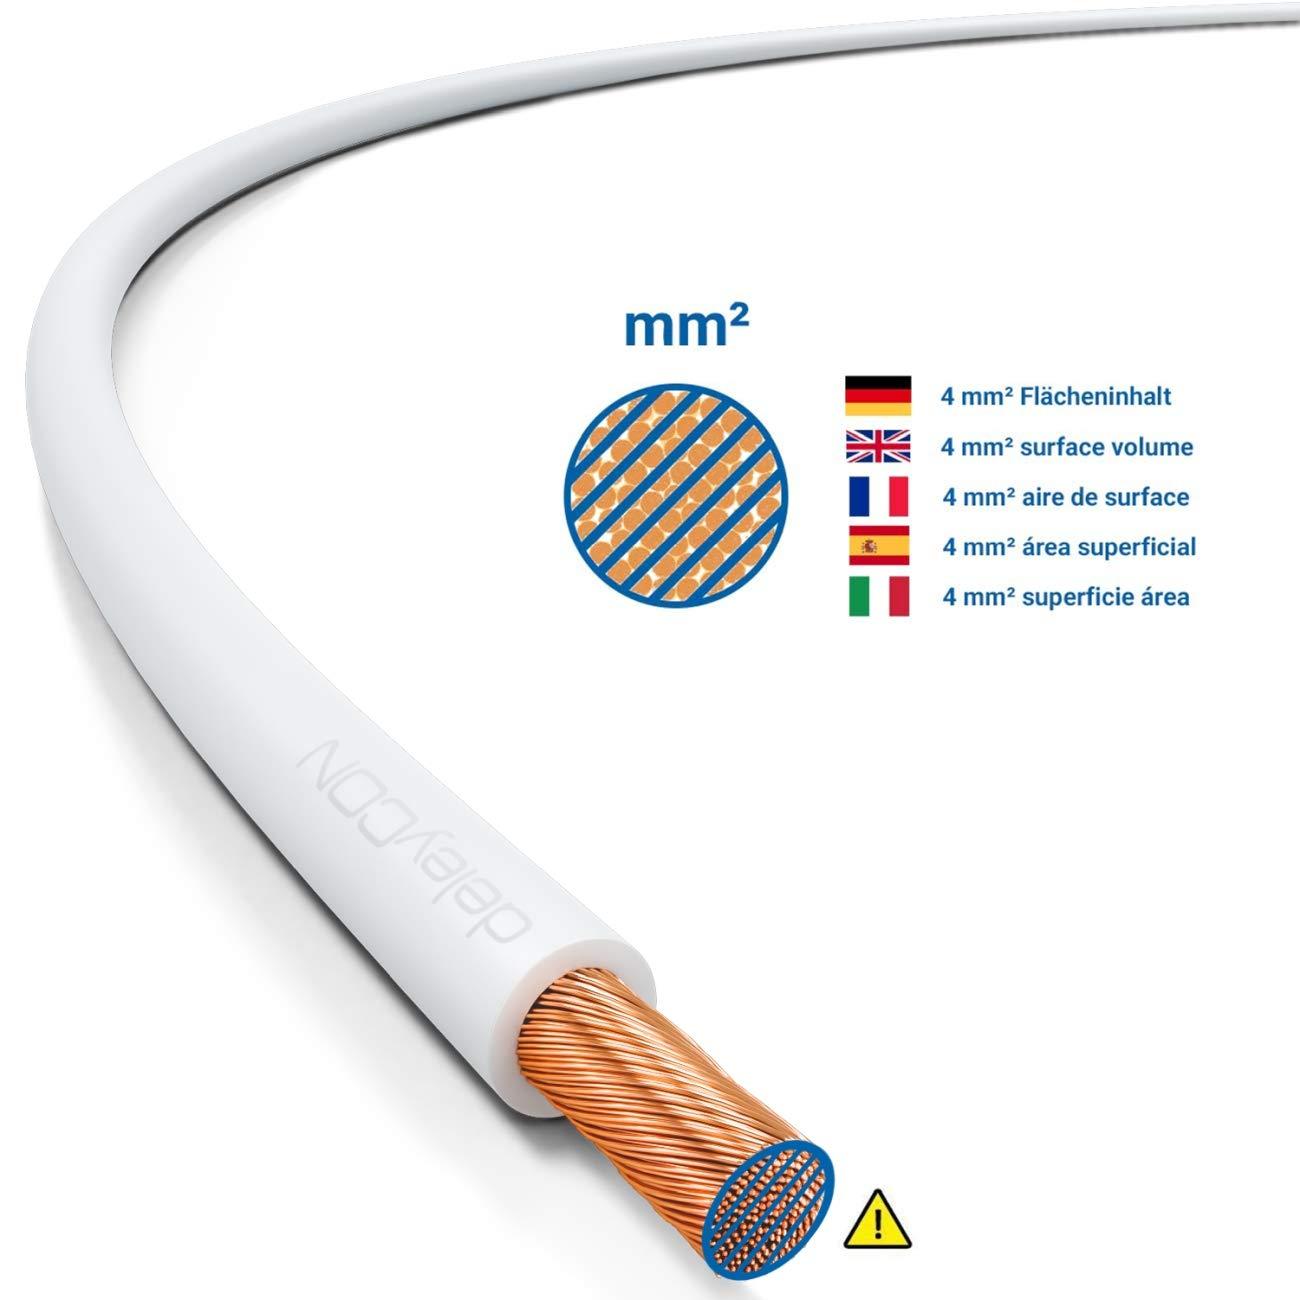 Negro deleyCON 30m de Cobre Cable de Altavoz 2X 4,0mm/² Cables de Foso Cable de Cobre S/ólido Aislado 99,9/% Pureza Marca de Polaridad 2x132x0,20mm Alambre Trenzado